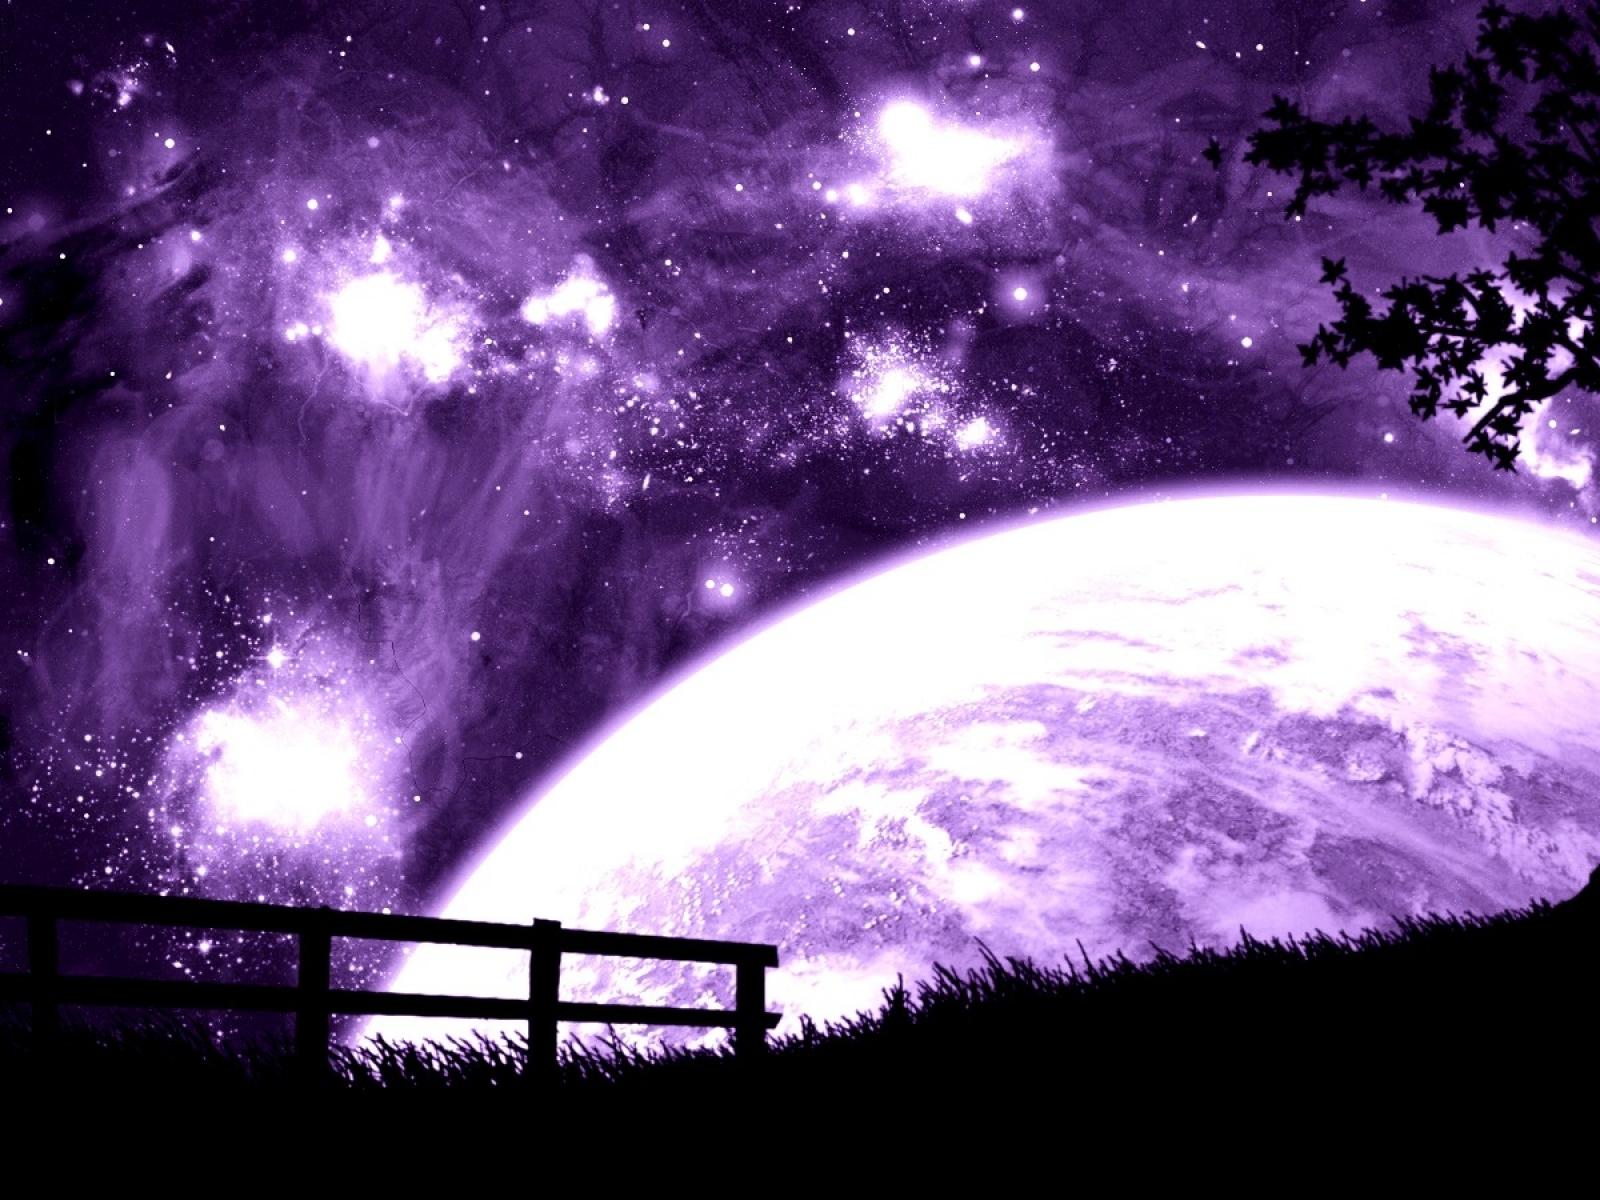 http://1.bp.blogspot.com/-GONmekEXLVc/UDMZhHIHtmI/AAAAAAAACAI/6euMjwJy9Mw/s1600/outer_space_planets_purple_1440x900_wallpaper_Wallpaper_1600x1200_www.wallpaperswa.com.jpg